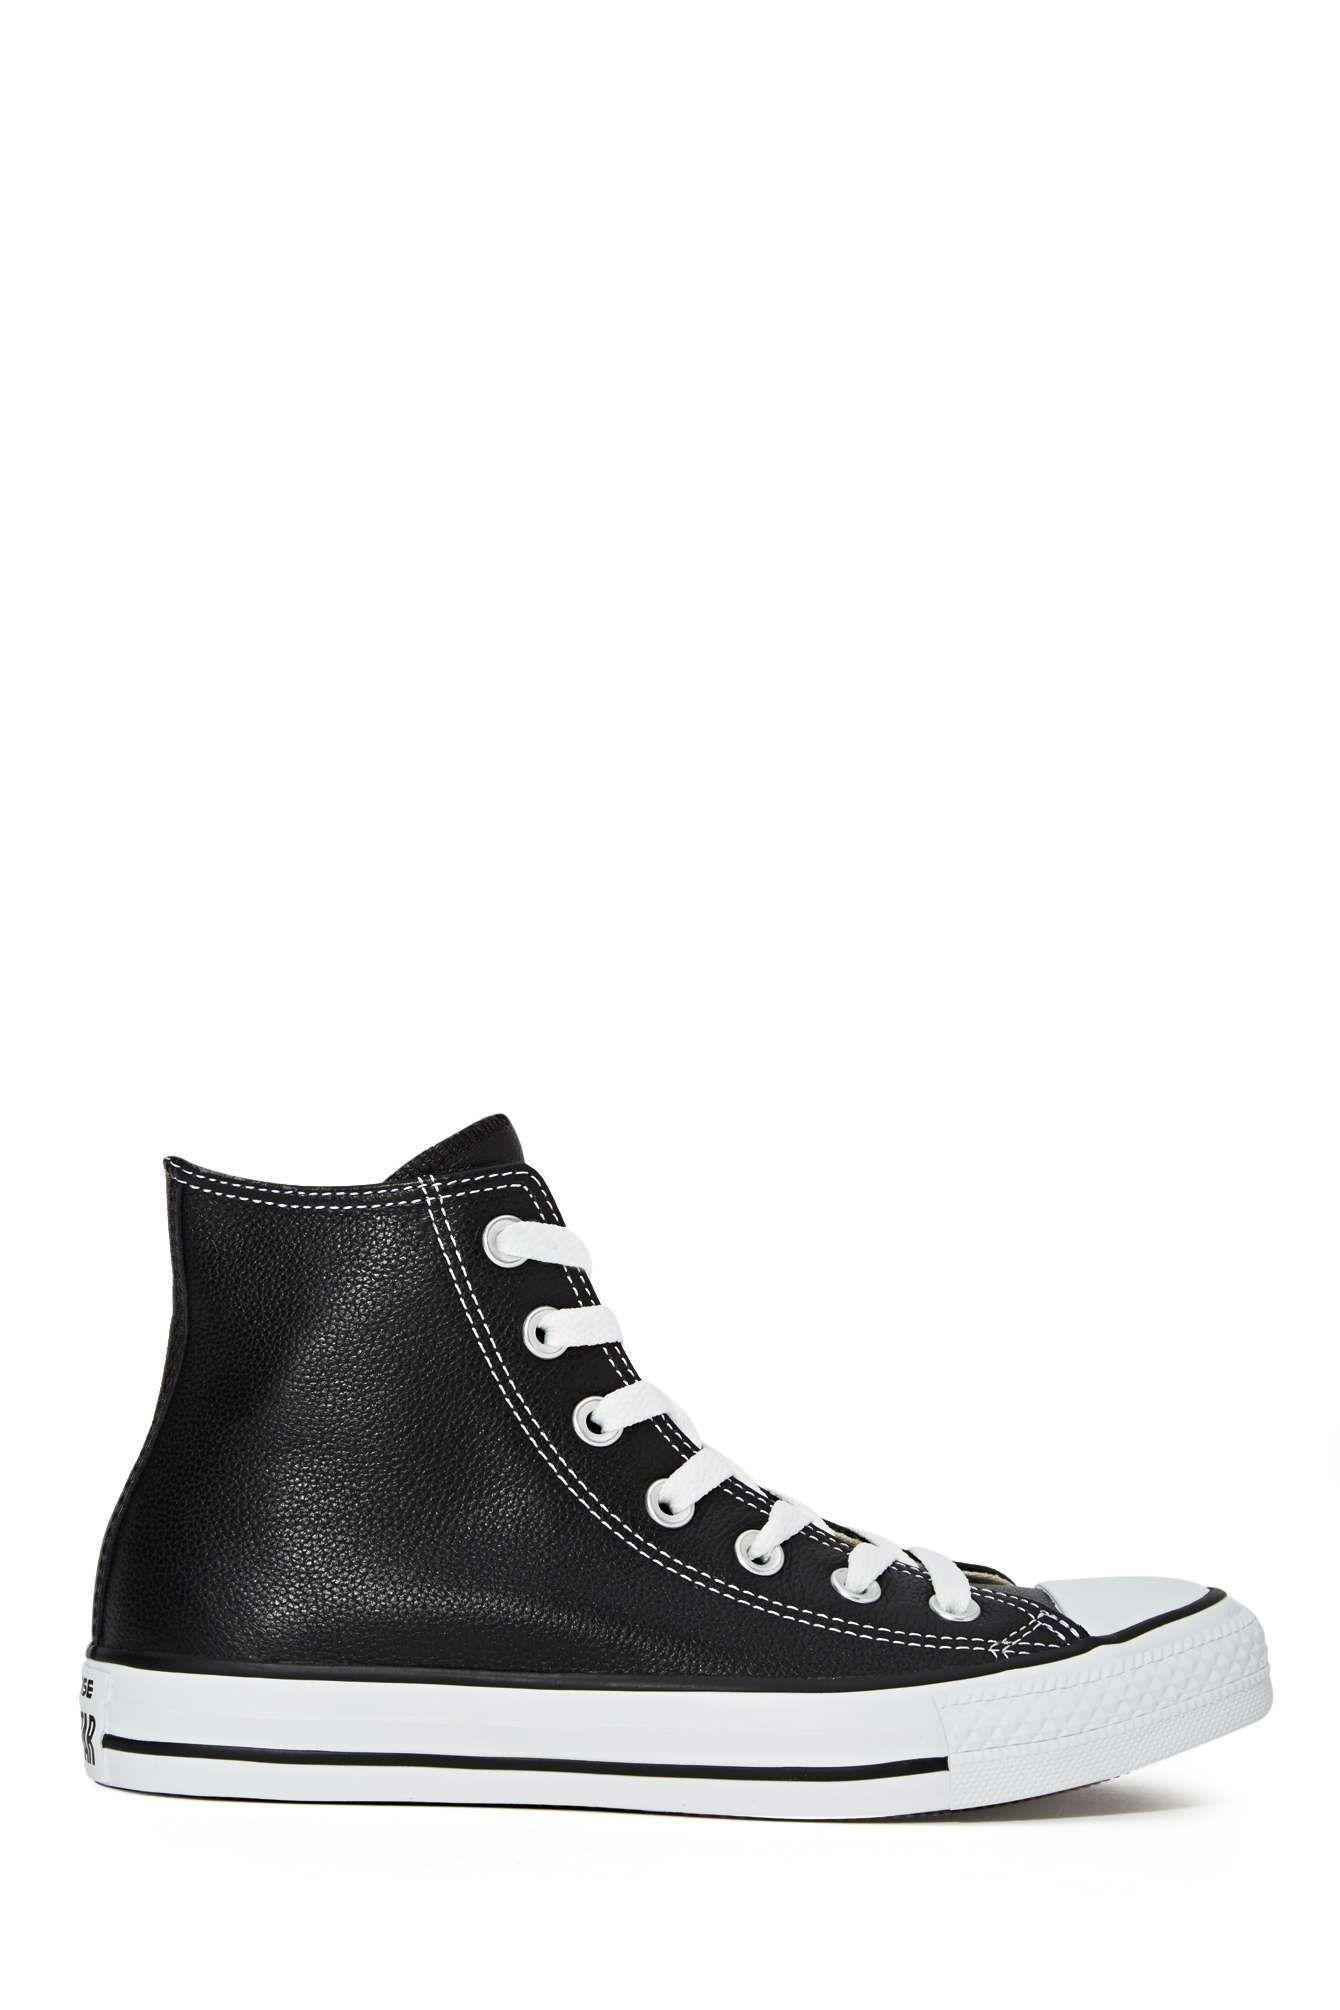 7042de52536 Converse All Star High-Top Sneaker